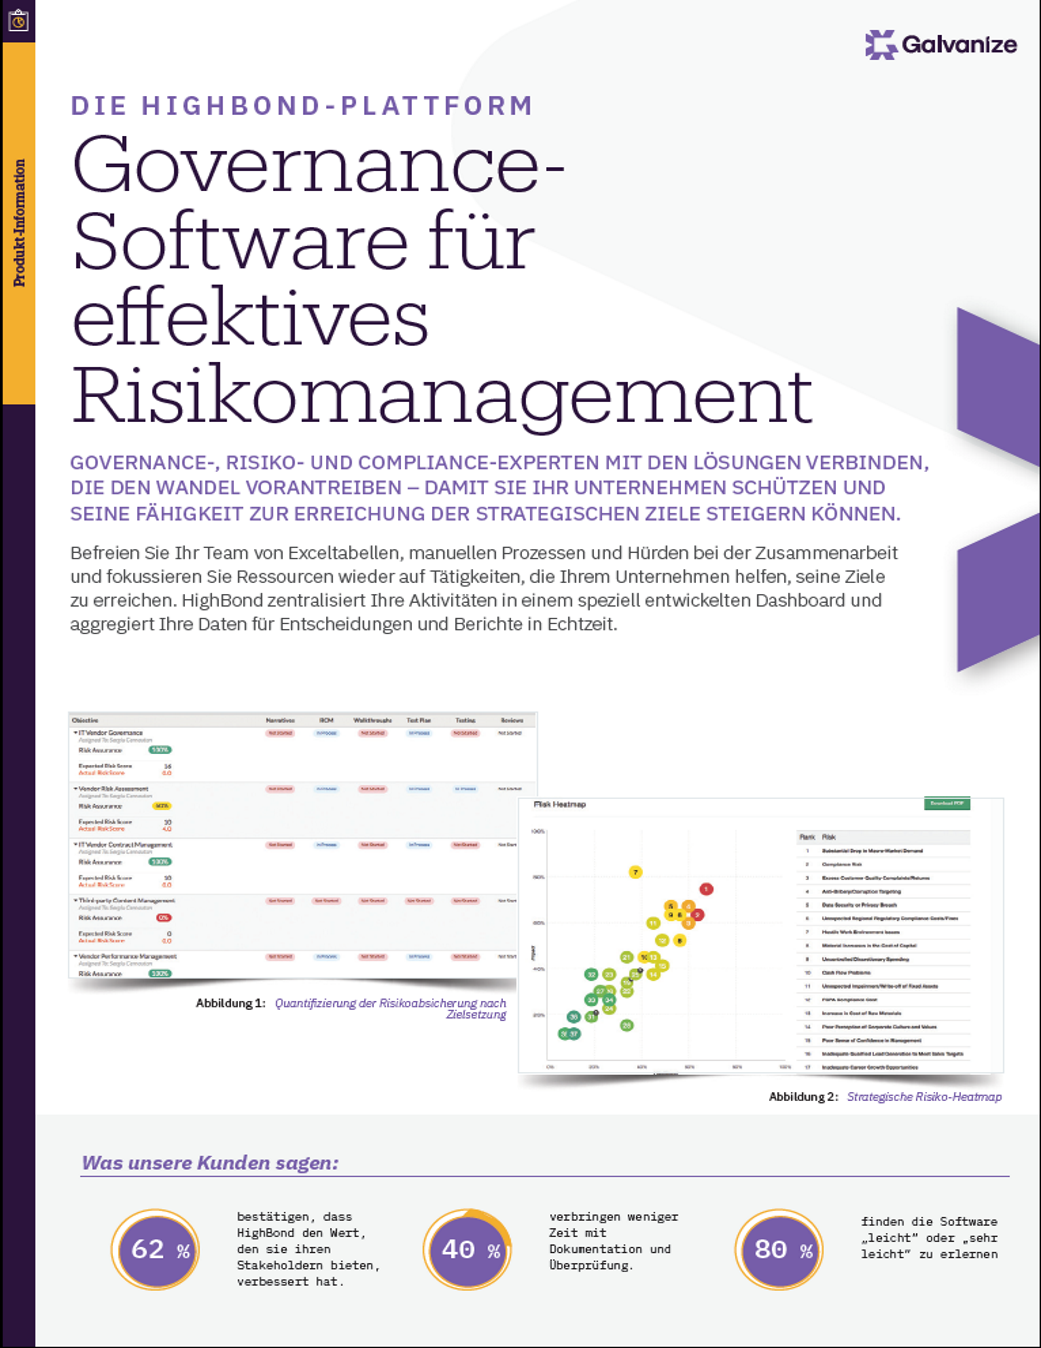 Governance-Software für effektives Risikomanagement